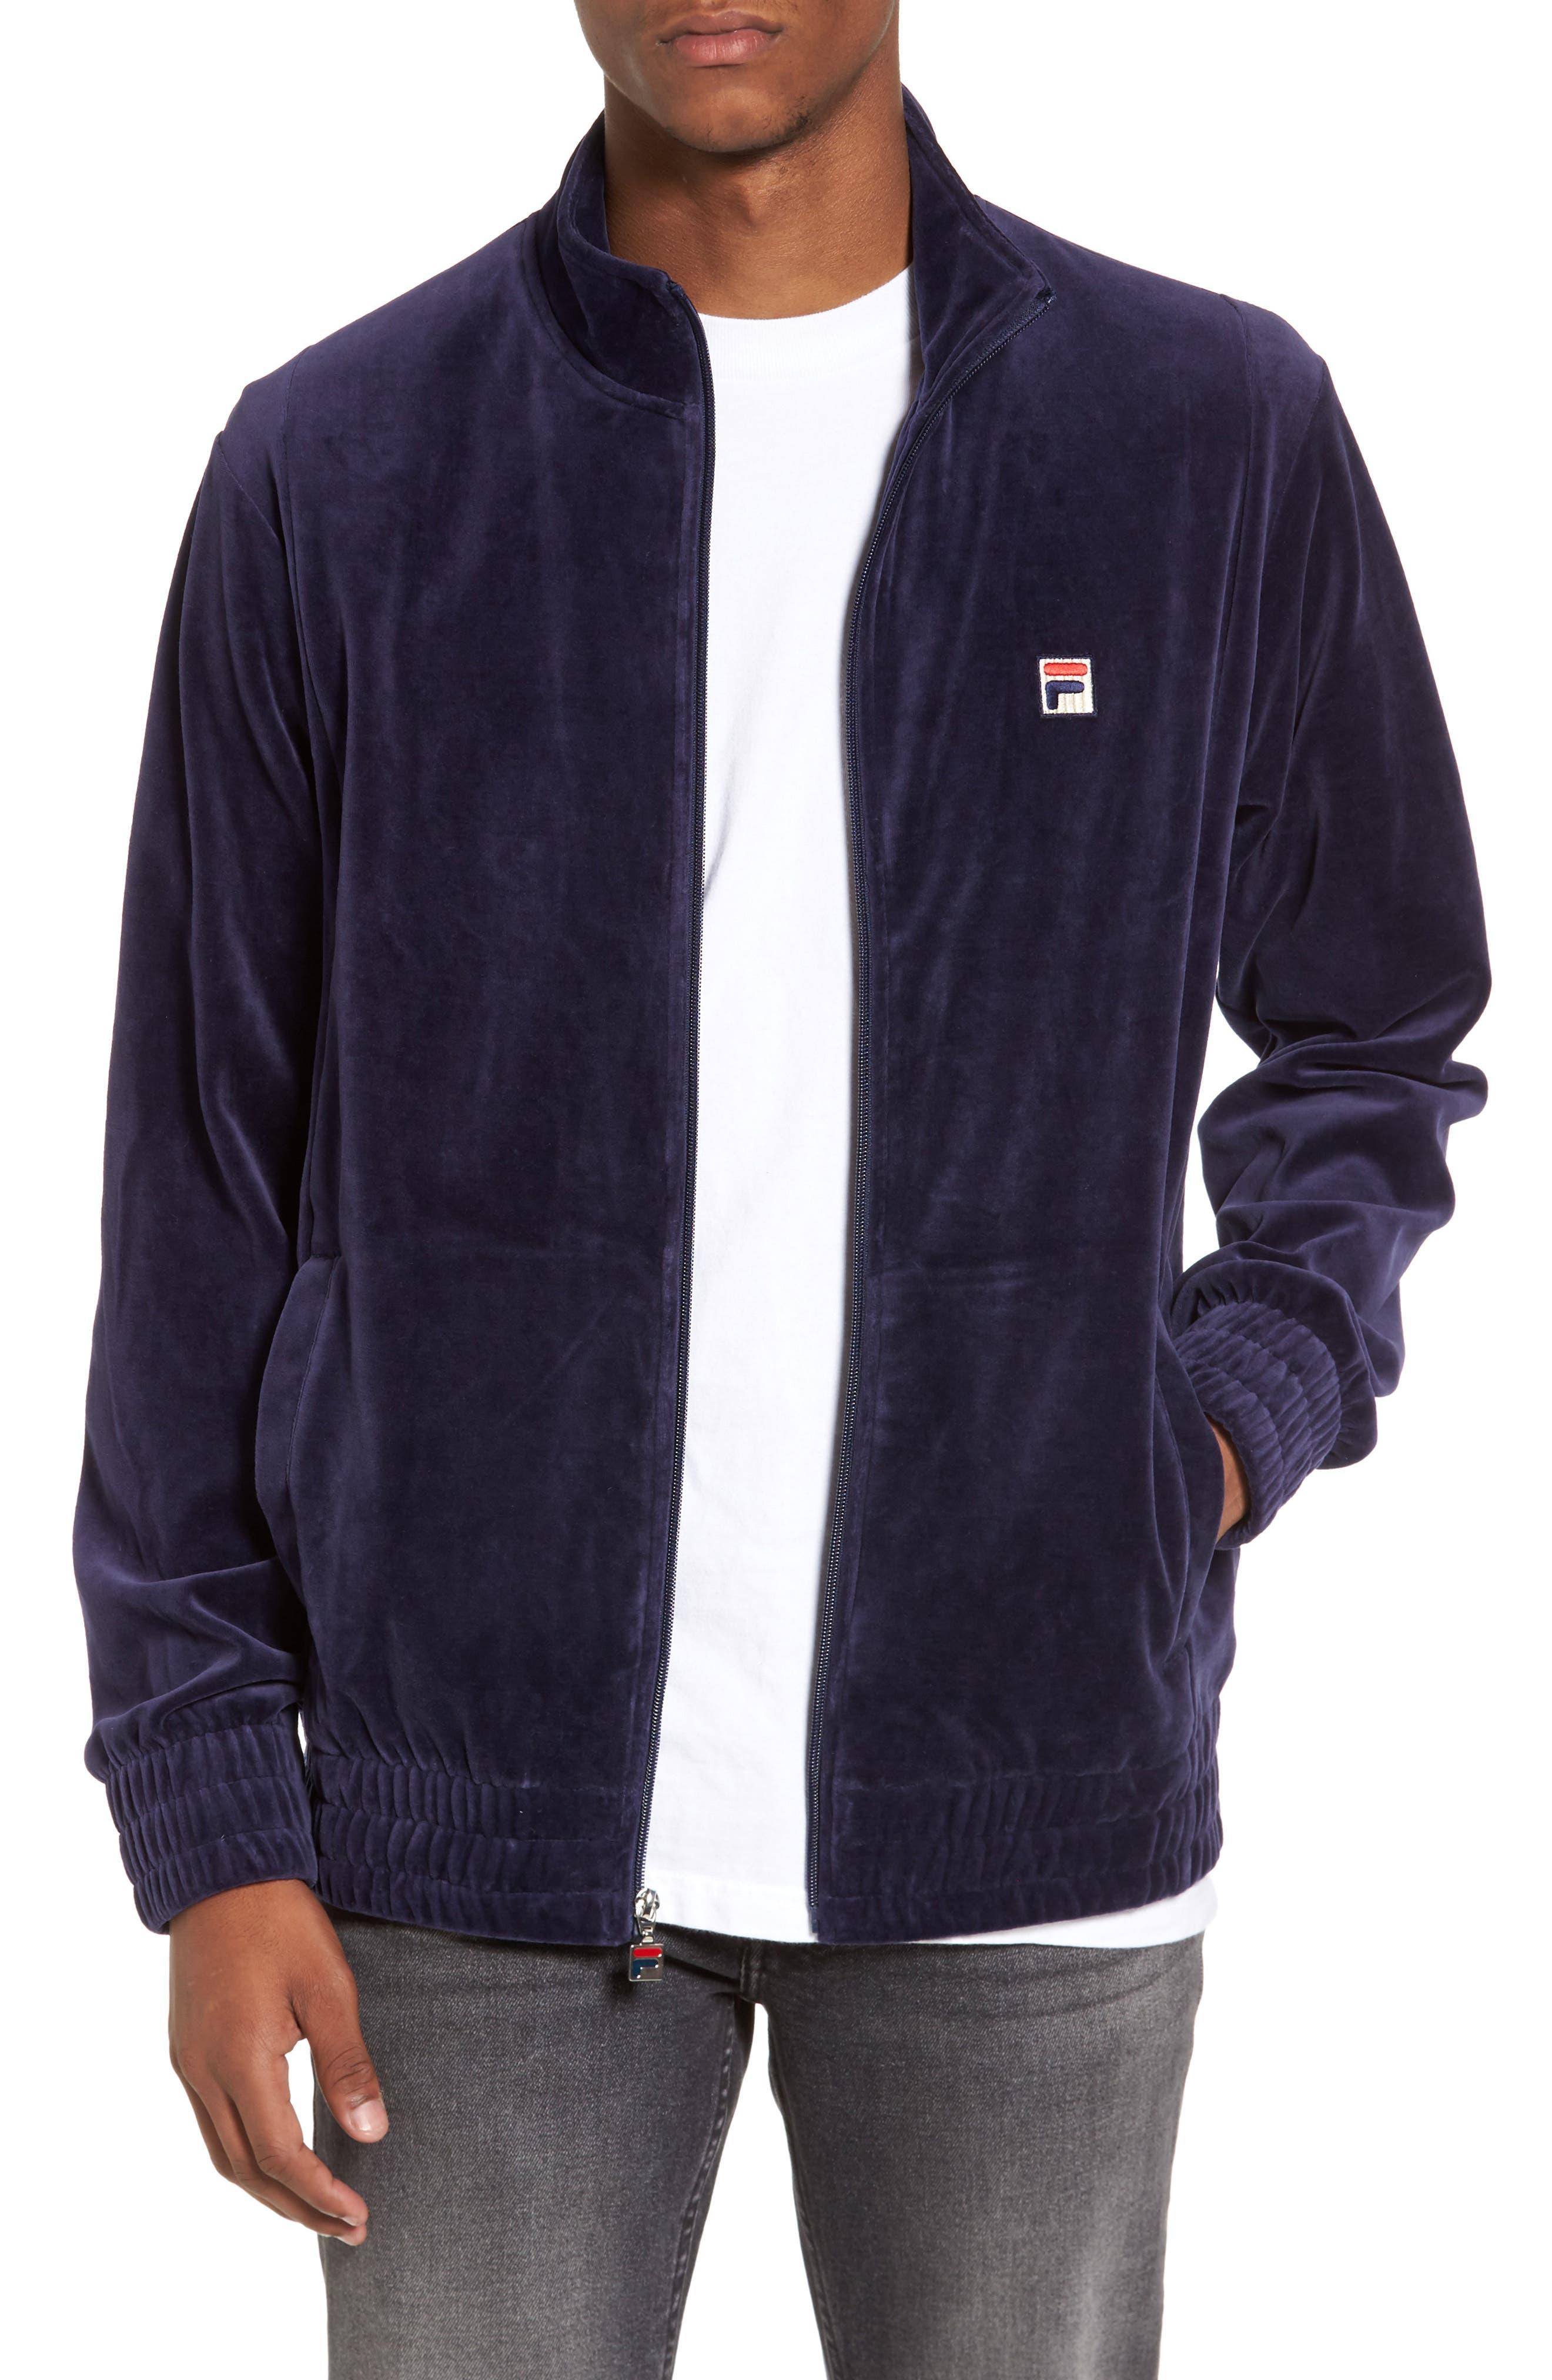 FILA Velour Jacket